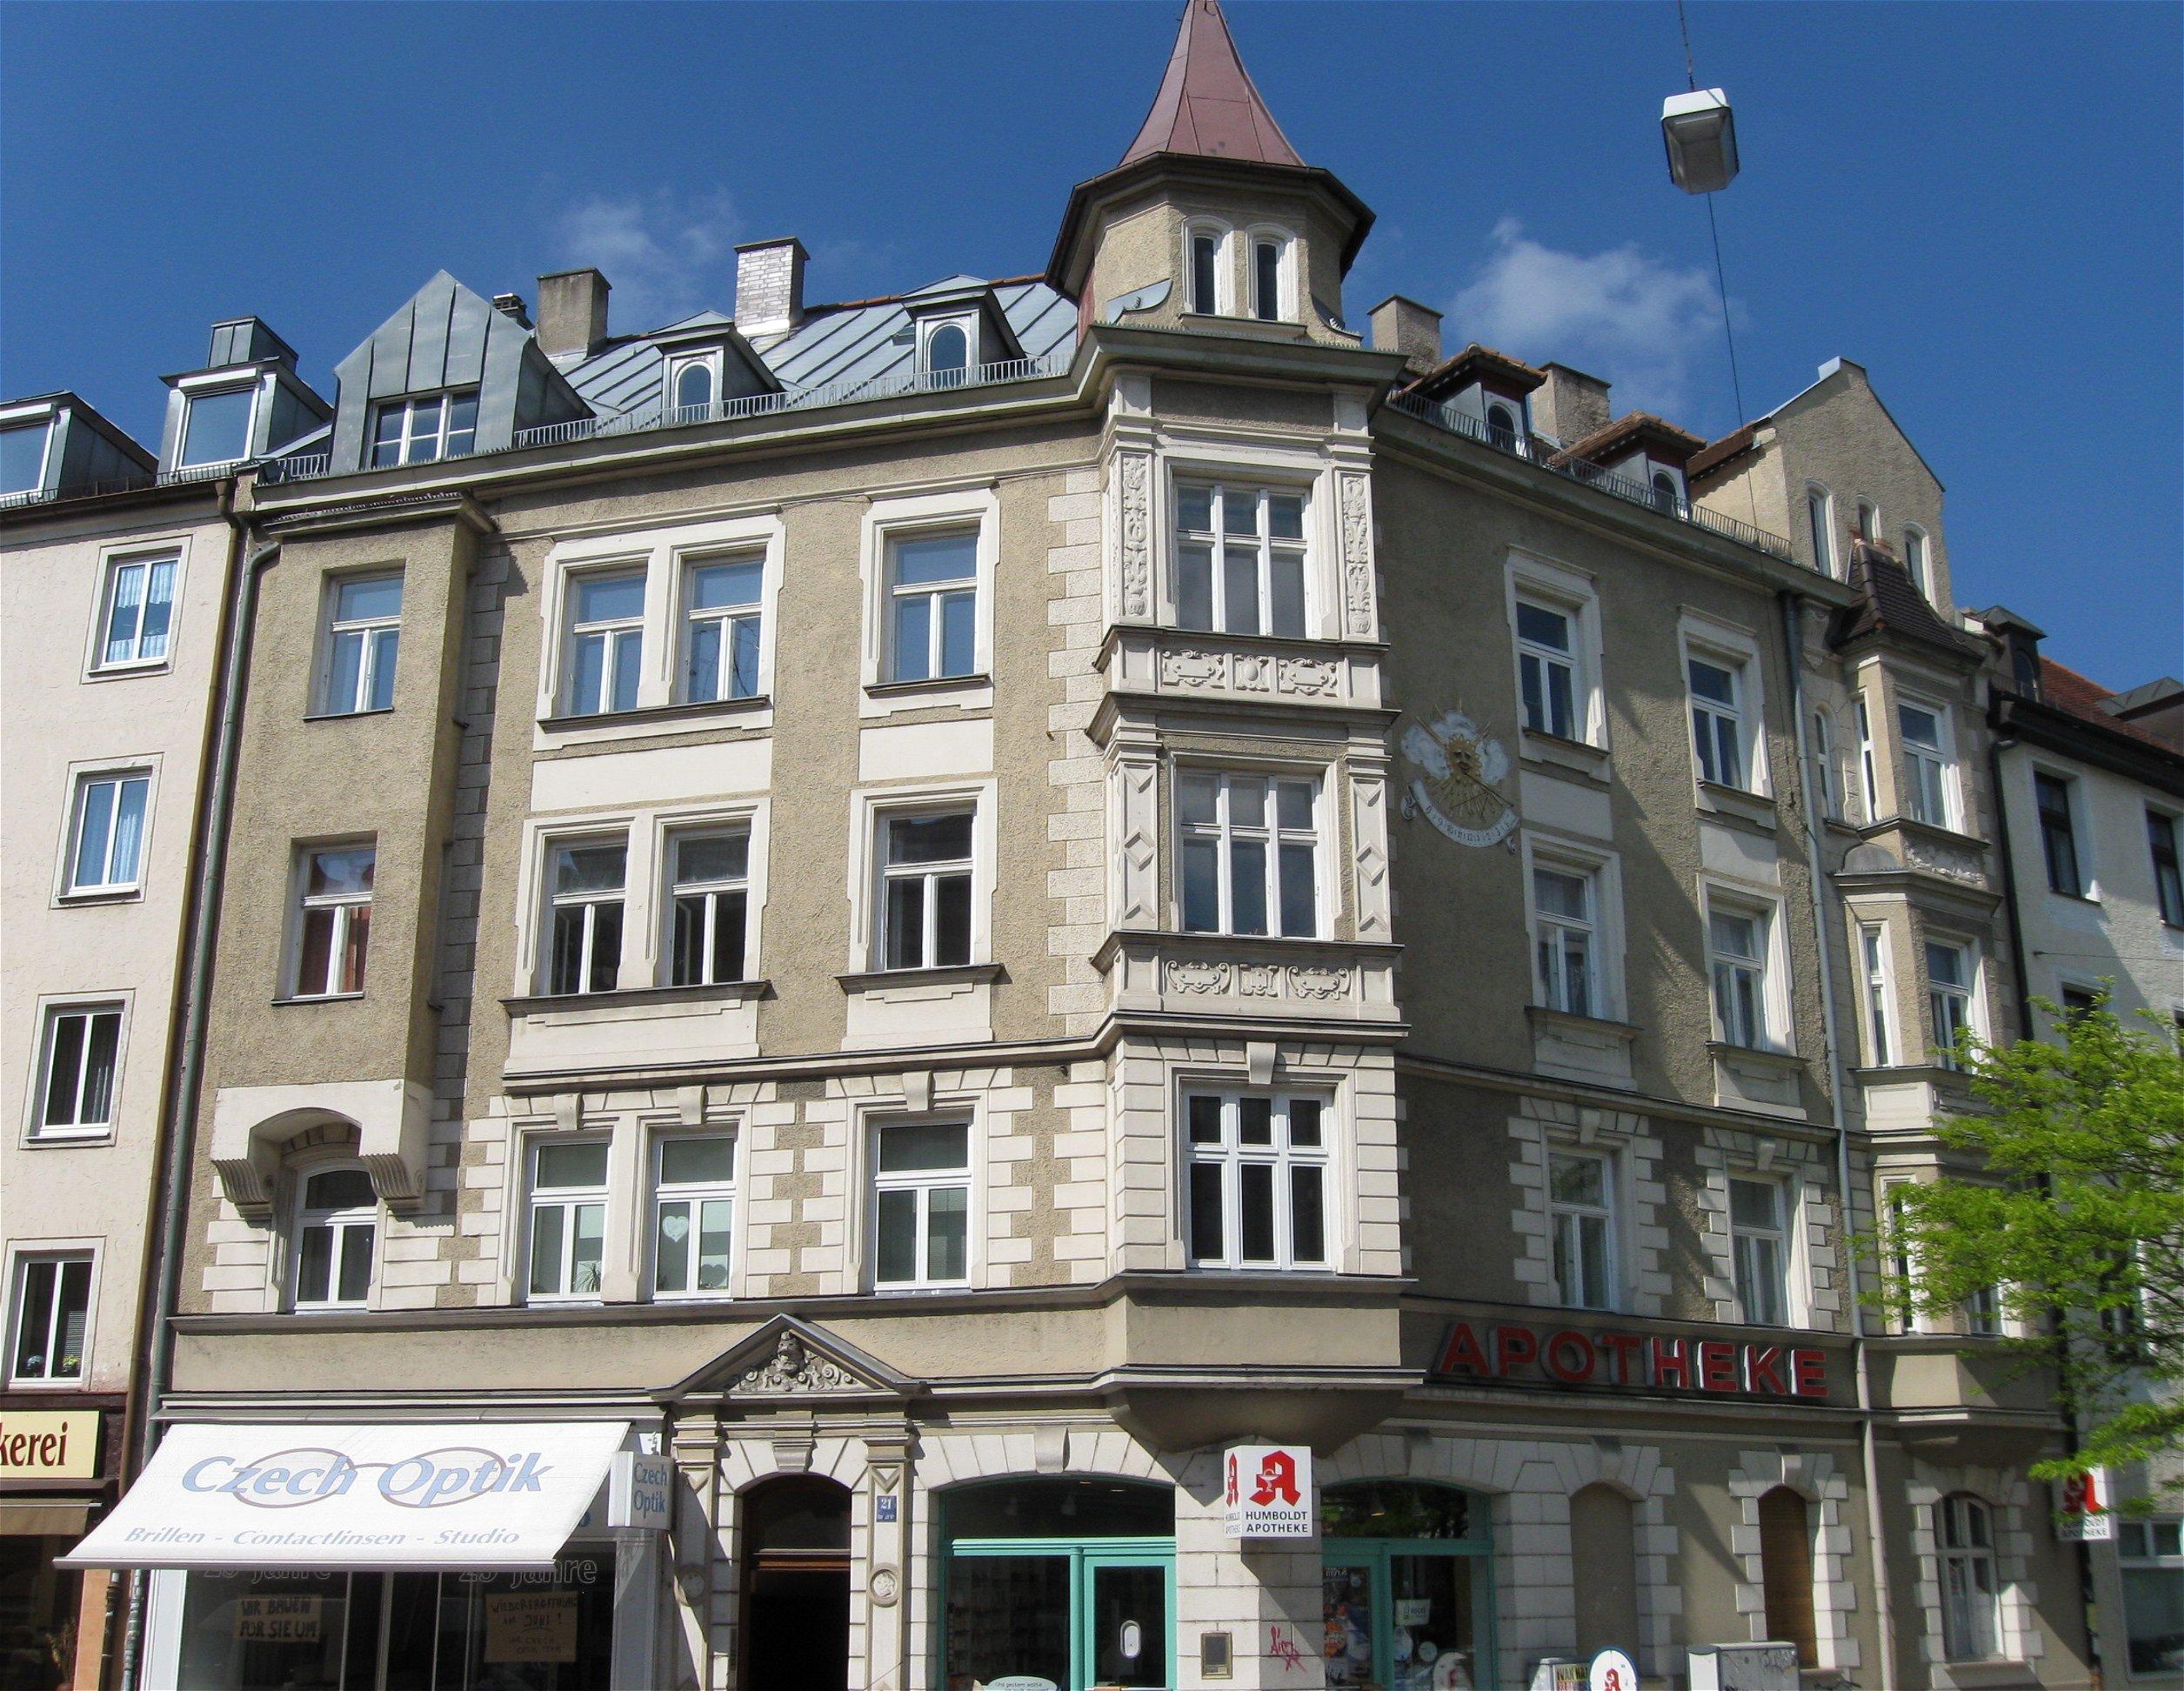 Humboldtstr München file humboldtstr 21 muenchen 1 jpg wikimedia commons